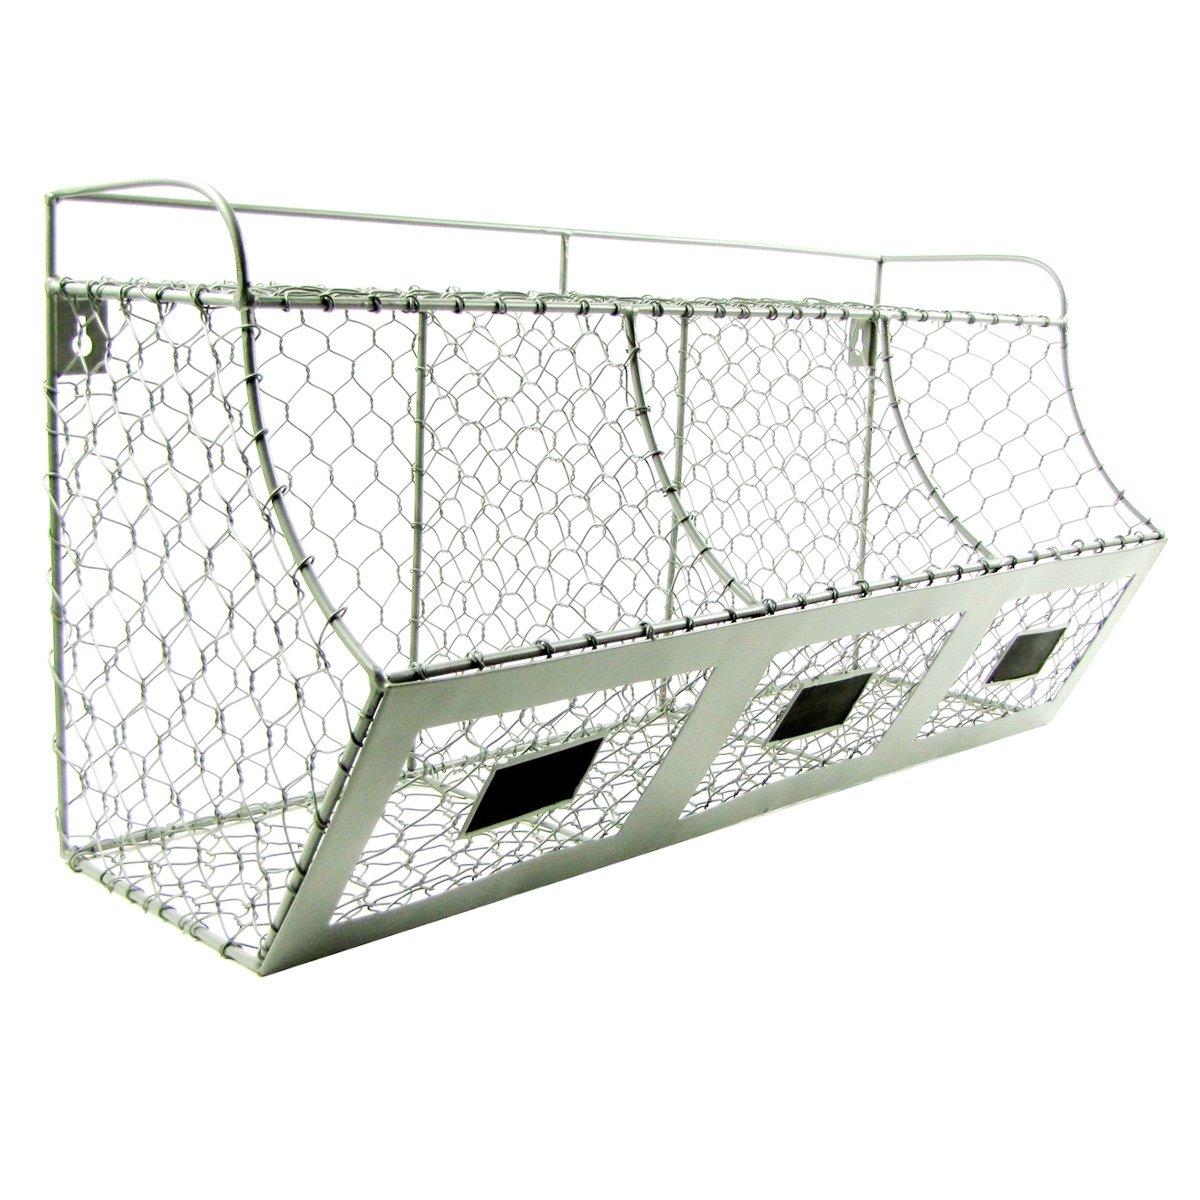 Amazon.com: Rustic Chicken Wire Wall Storage 3 Bin Basket Primitive ...